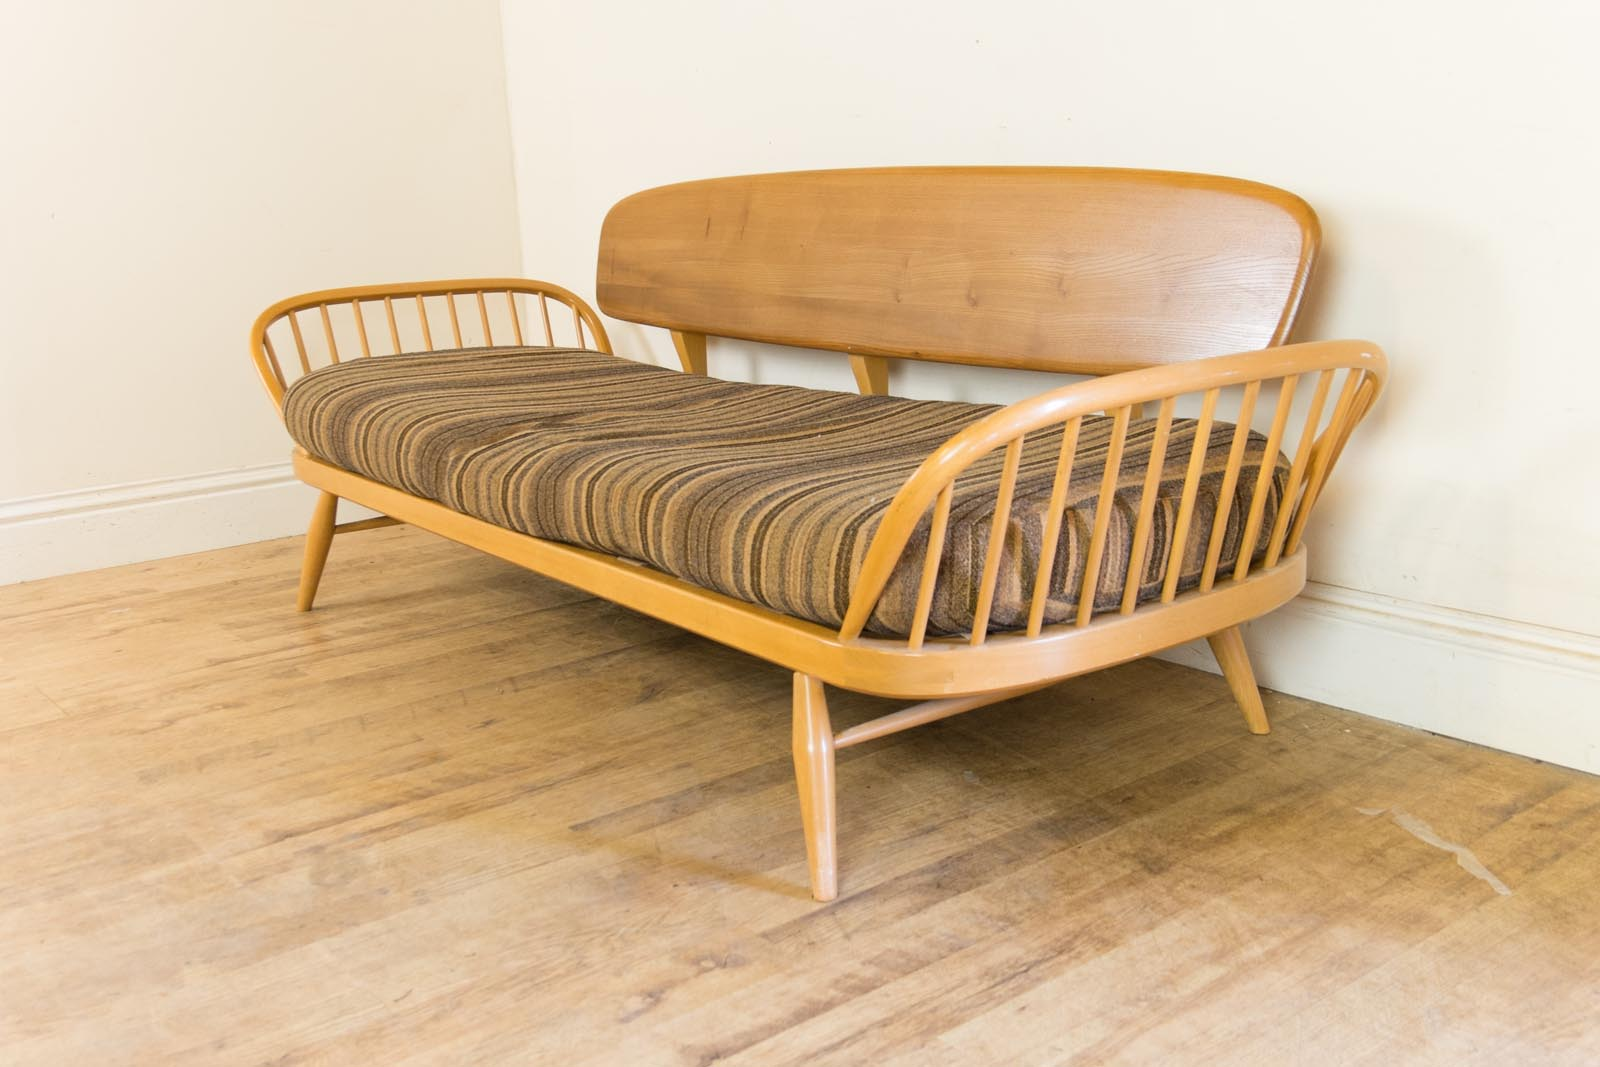 Vintage Retro Ercol Light Elm Day Bed Studio Couch Sofa Blonde Ebay